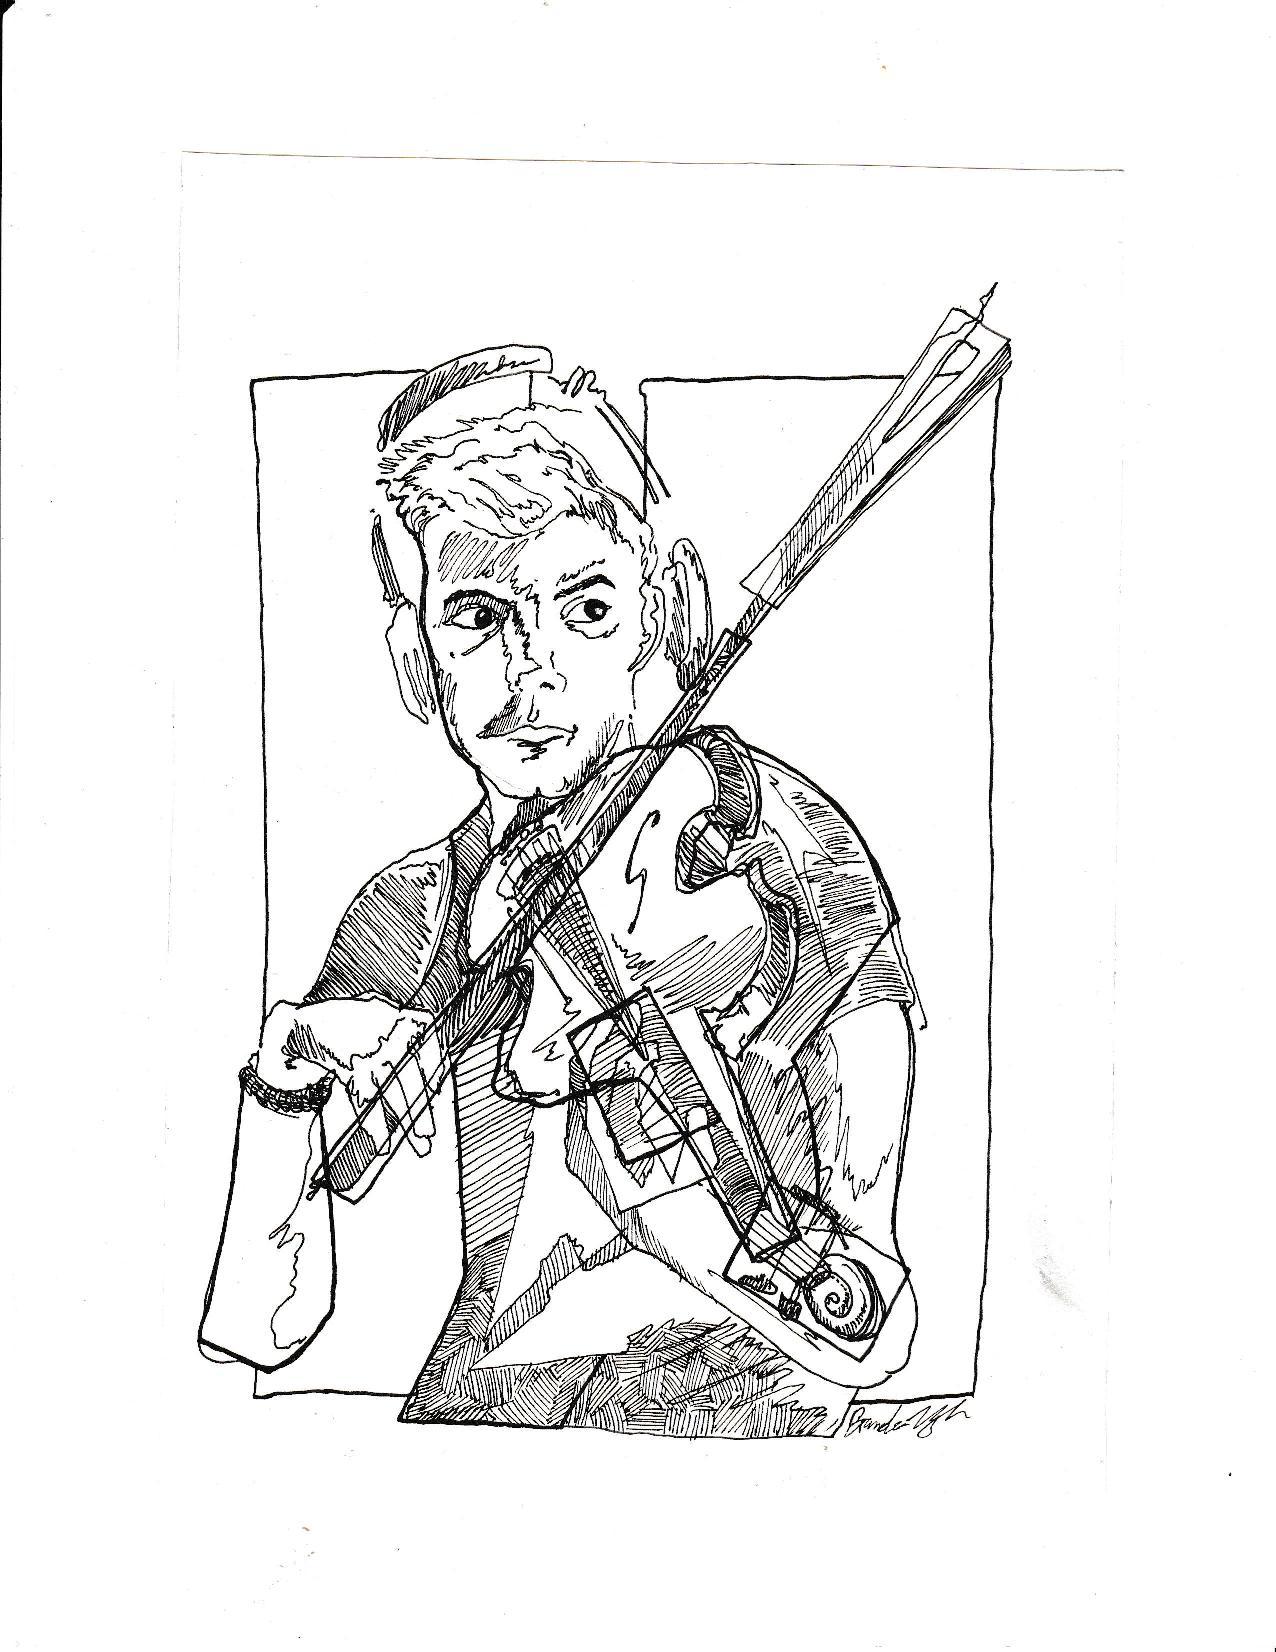 Brian Sketch-page-001.jpg